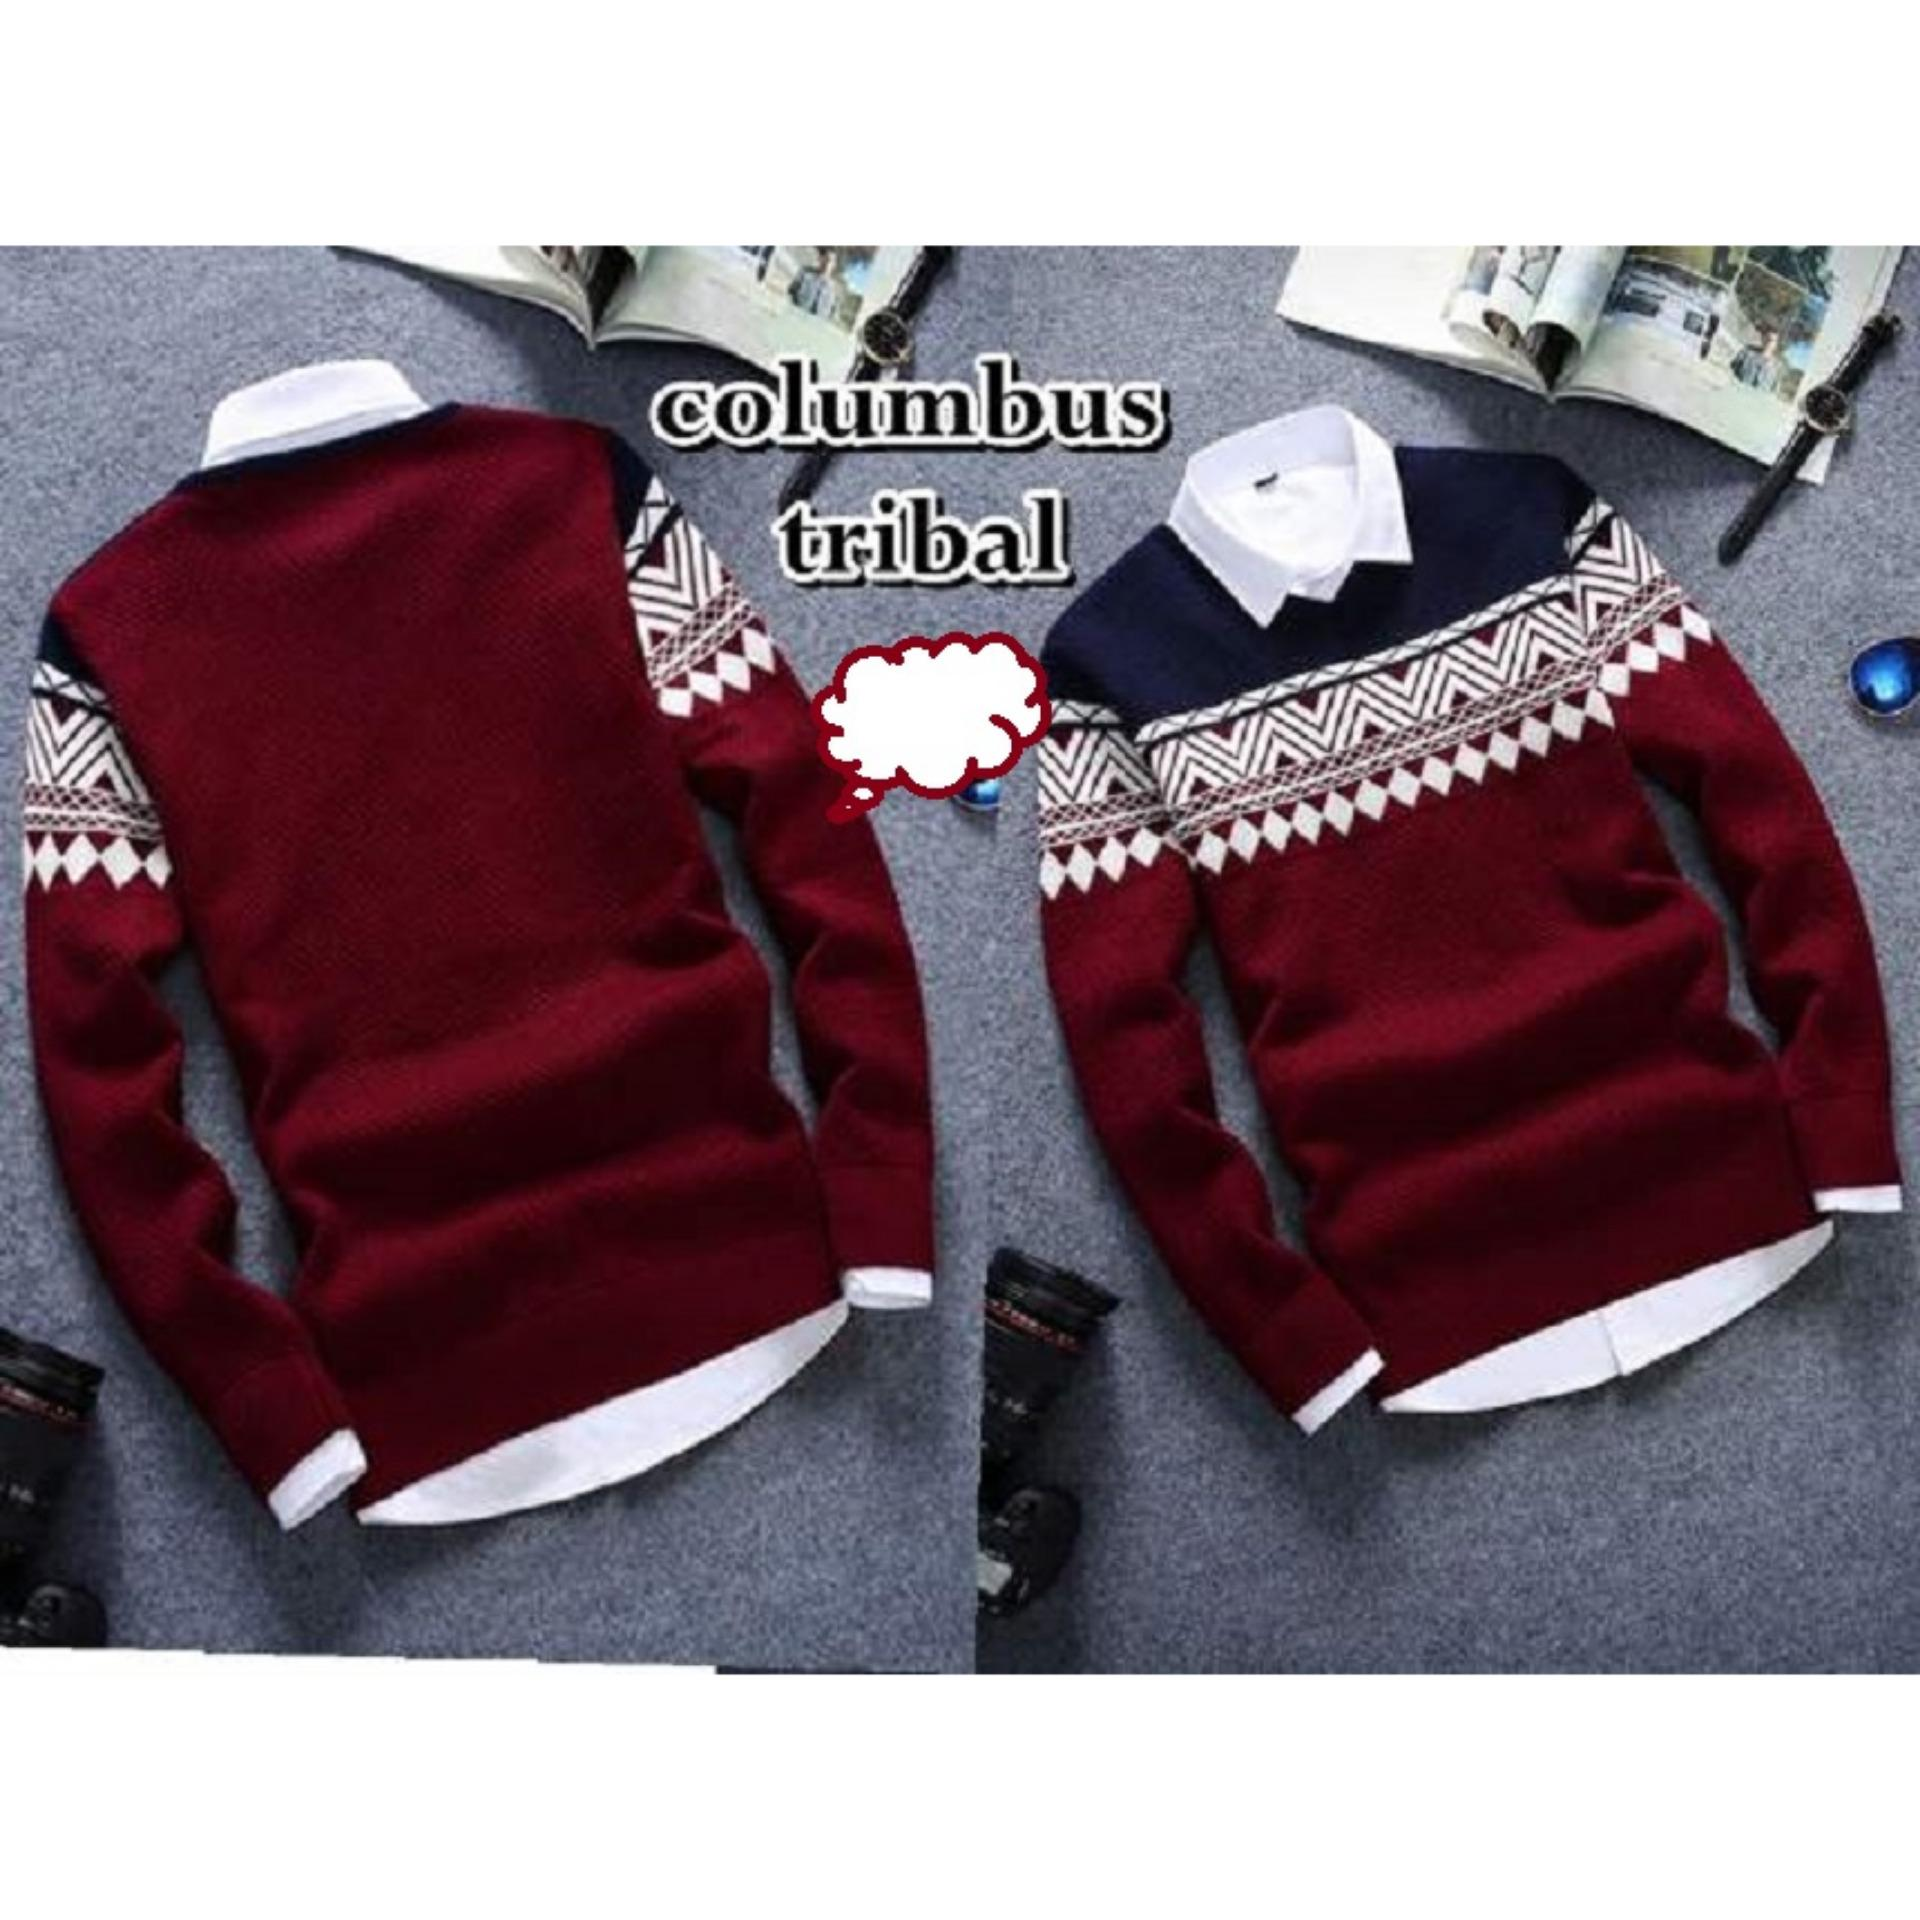 Toko Sweater Pria Columbus Tribal Good Quality Maroon Tjk Online